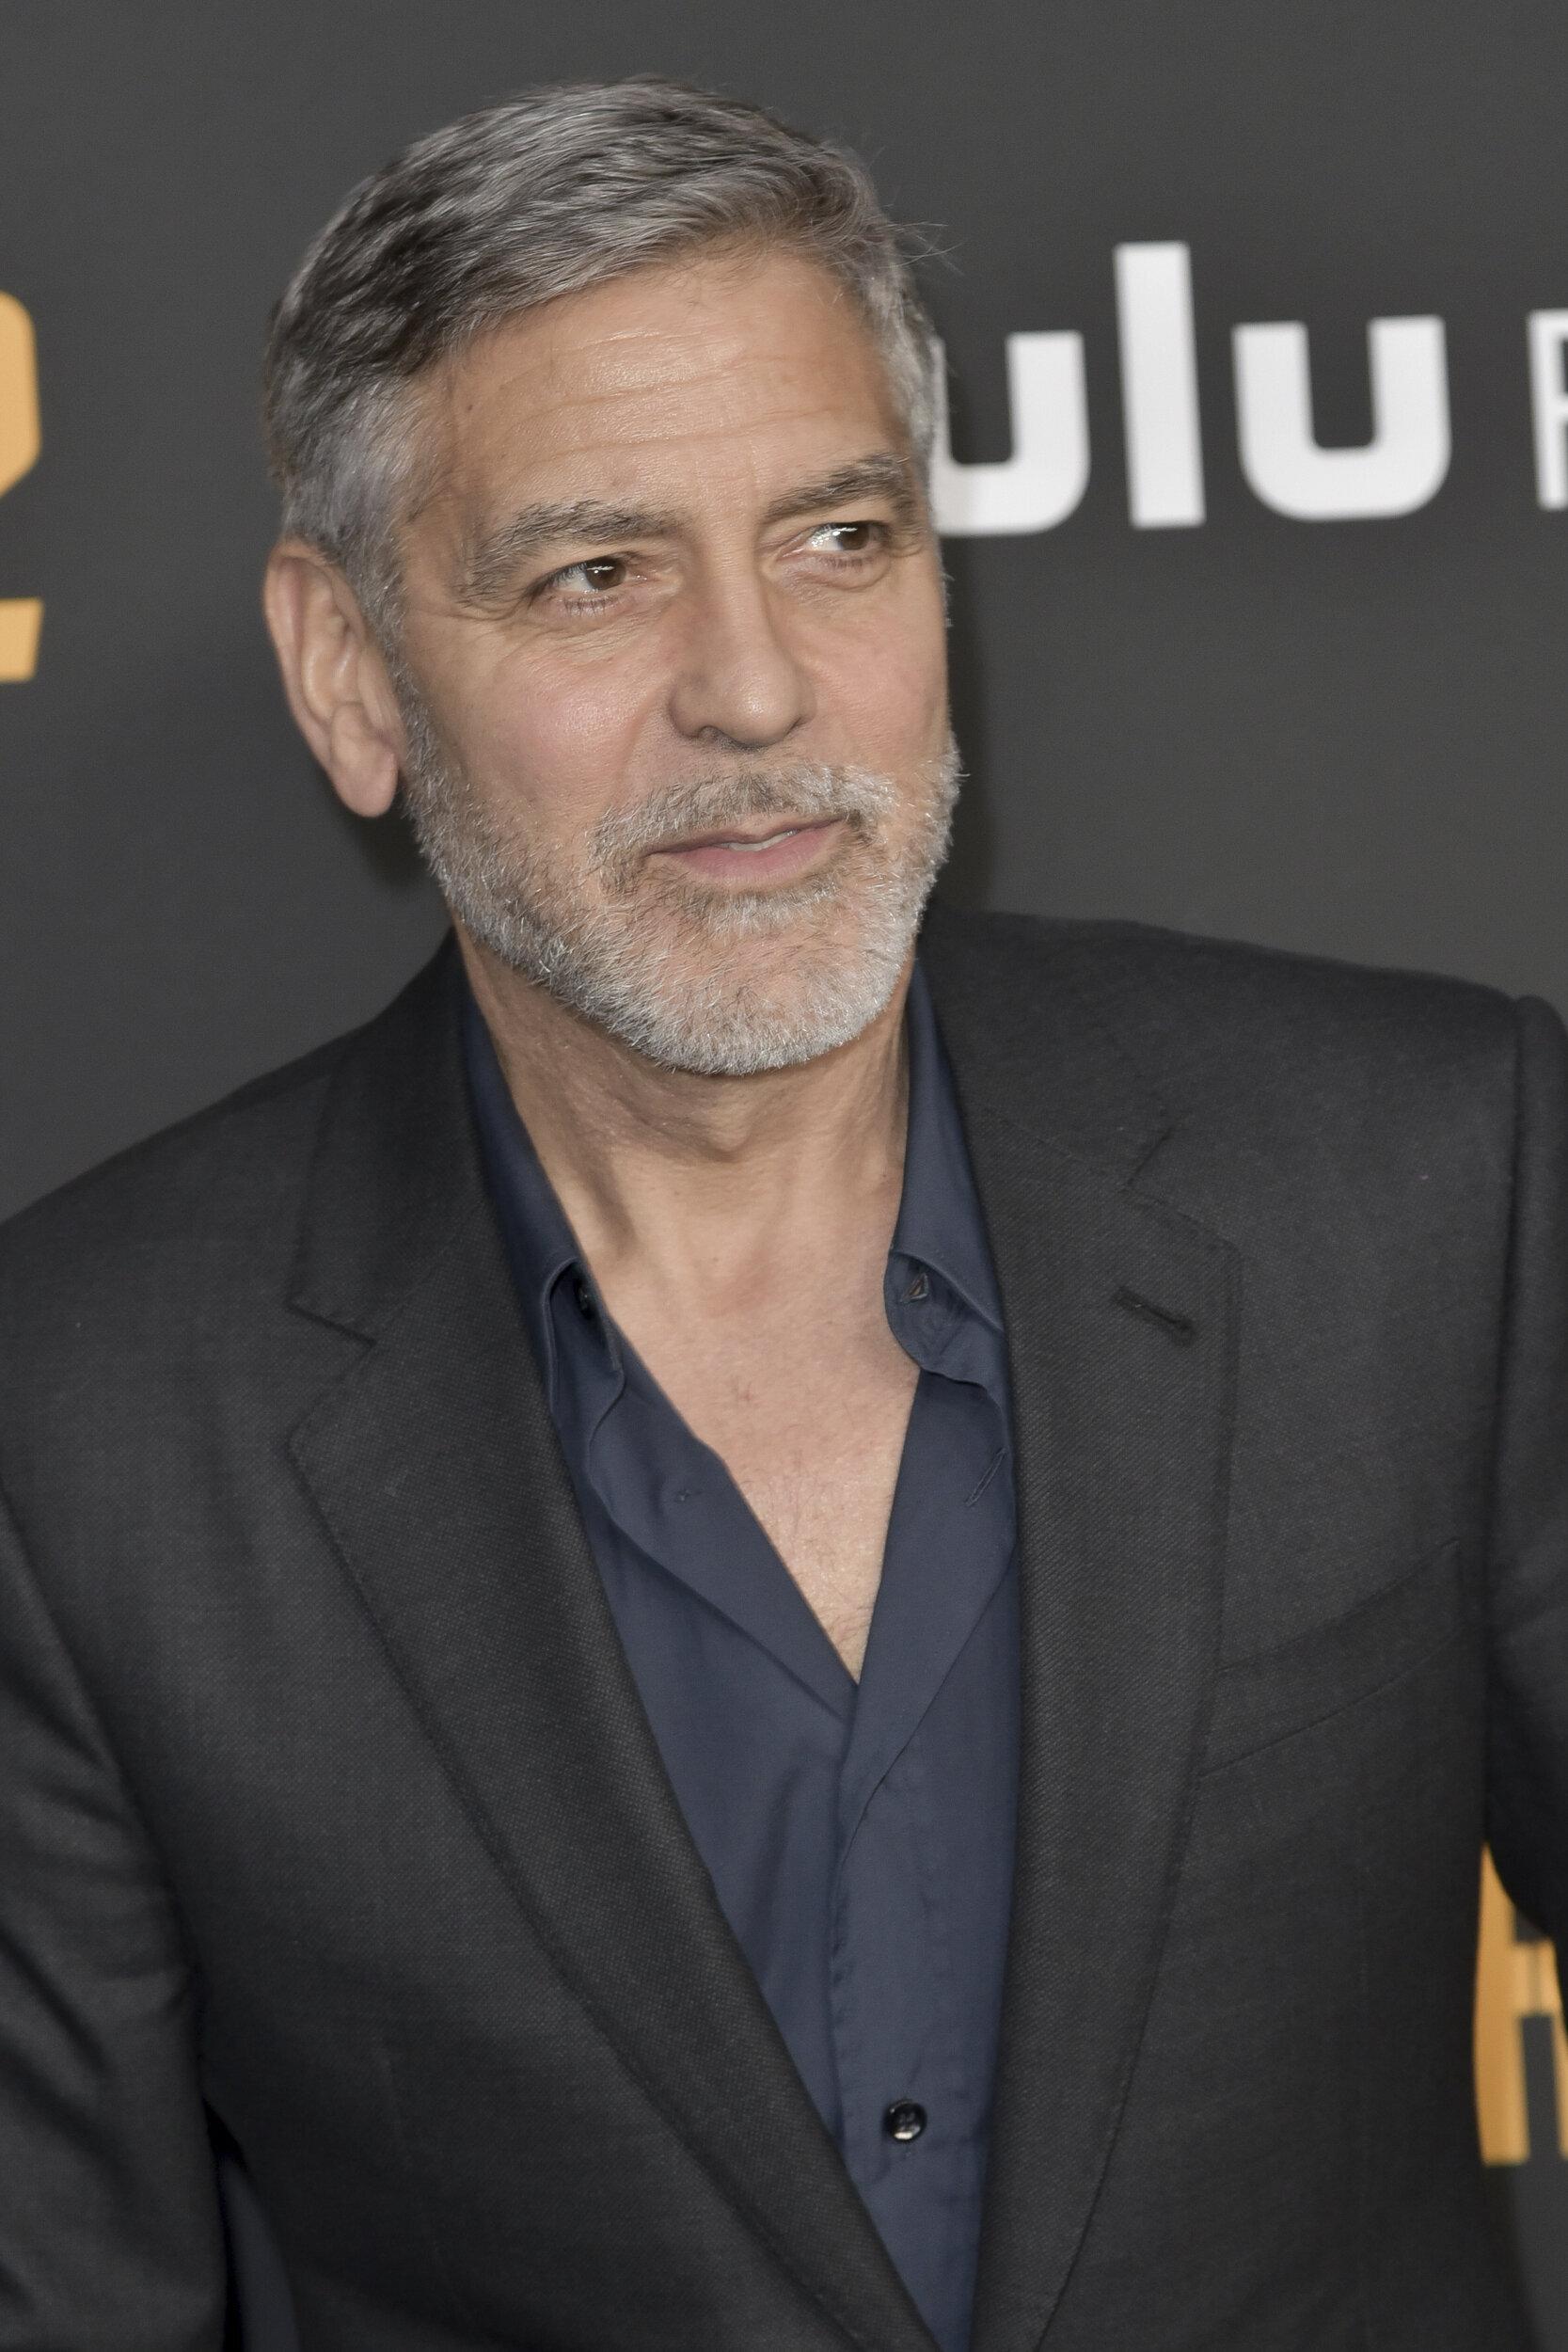 George Clooney Misfires Among LGBTQ Activists Over Brunei 'Warning Shot' Remarks